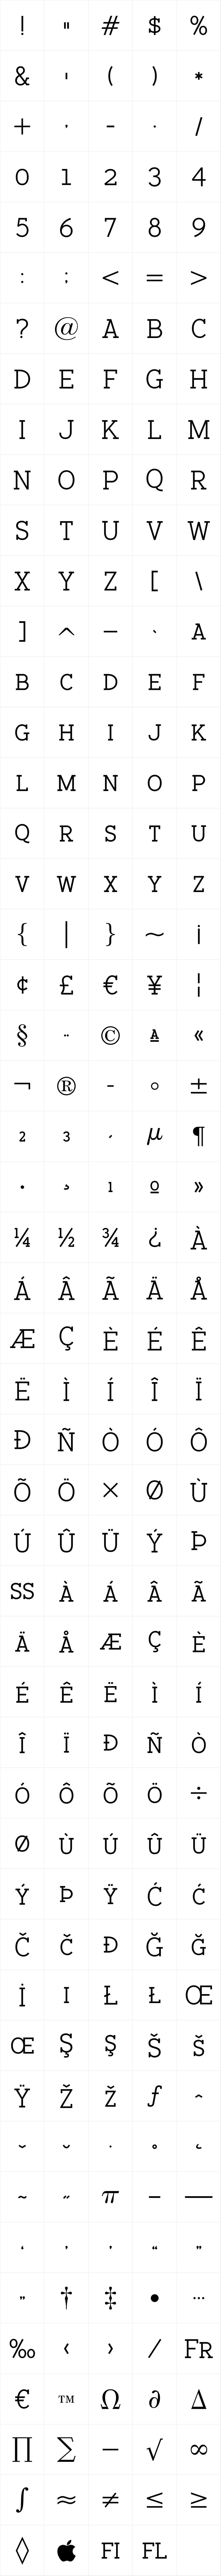 Backtalk Serif BTN SC